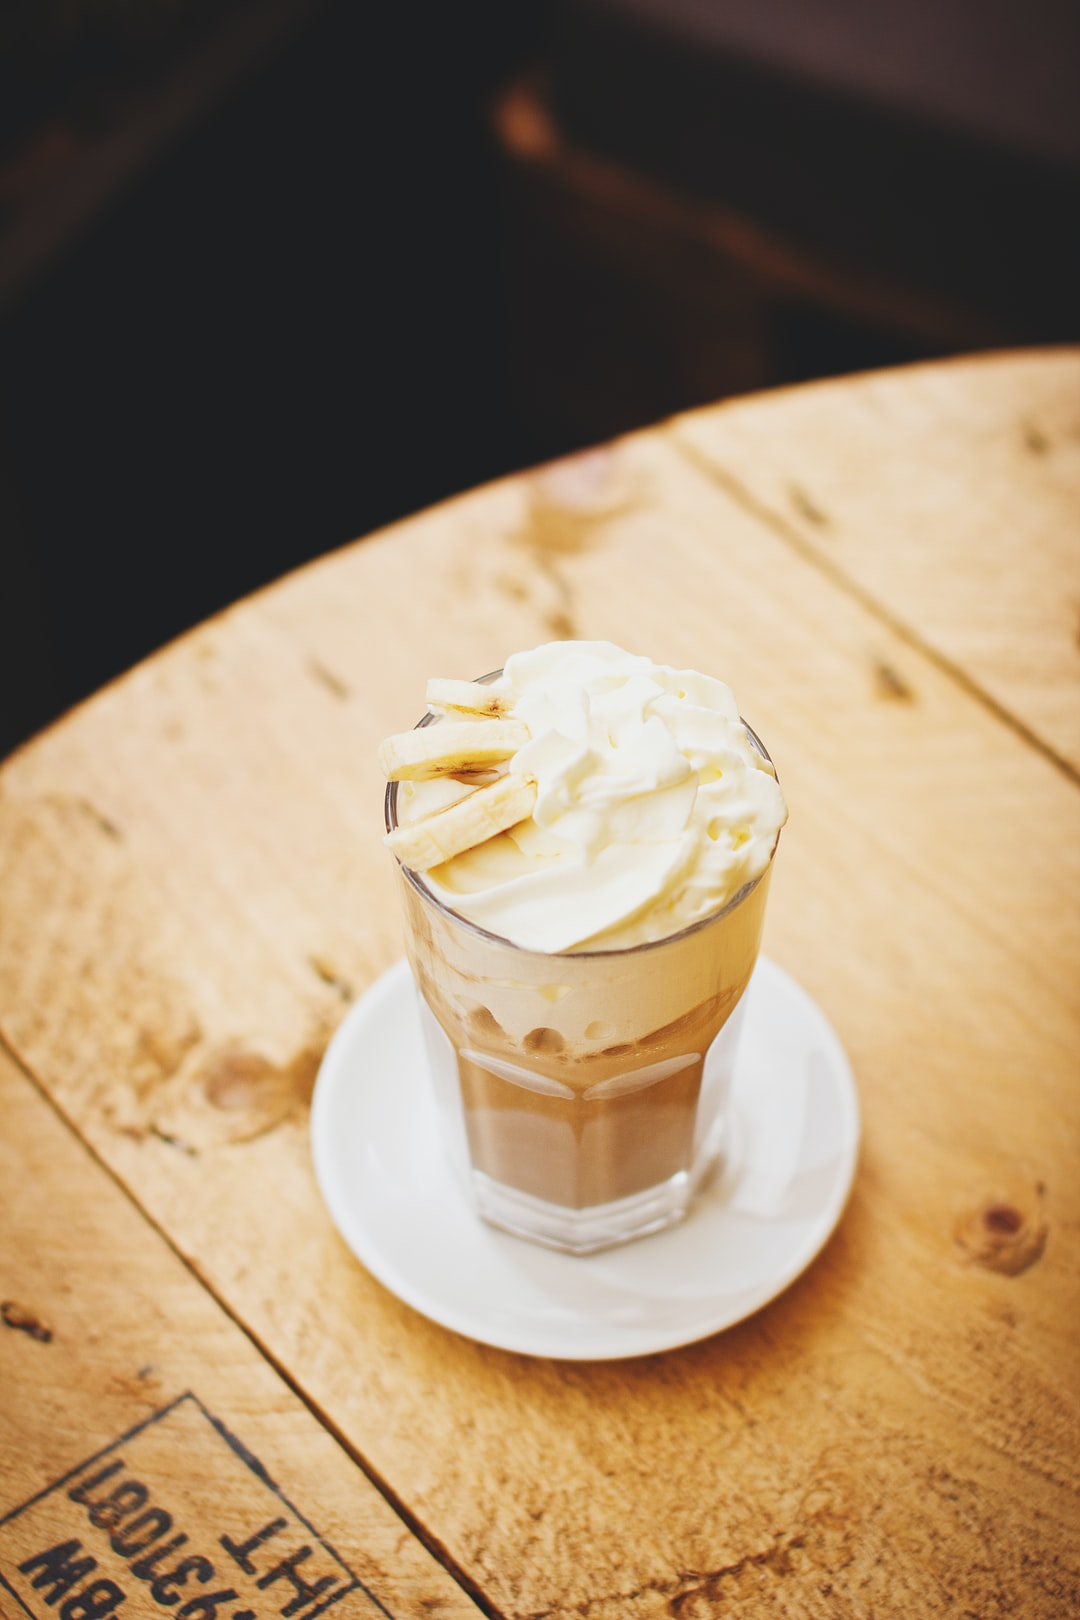 Sweet Coffee Drink